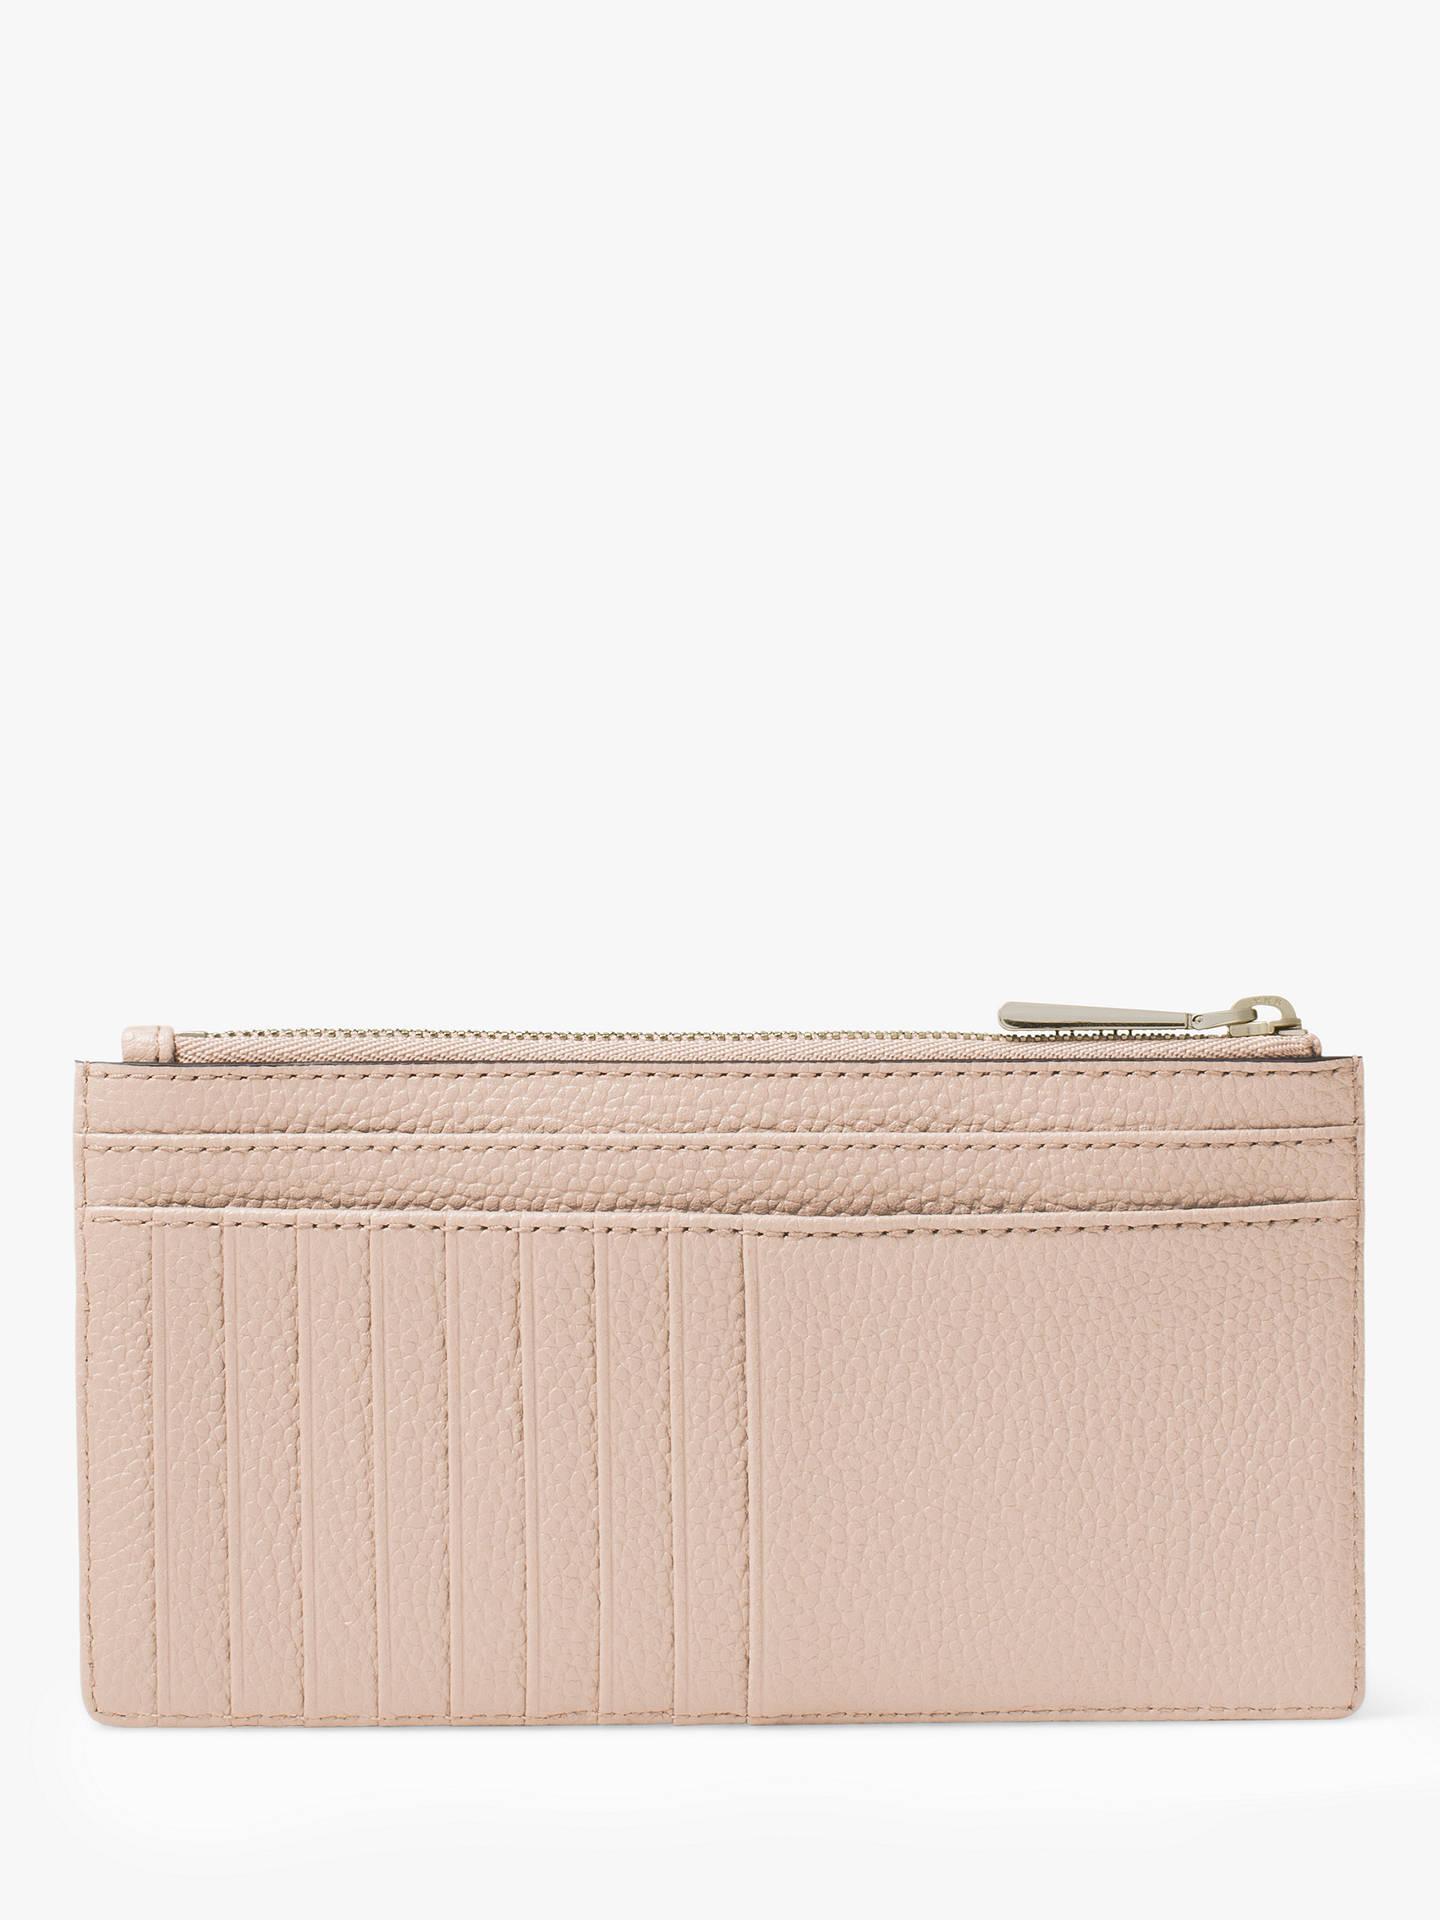 finest selection 99e55 42916 MICHAEL Michael Kors Money Pieces Leather Slim Card Purse, Soft Pink